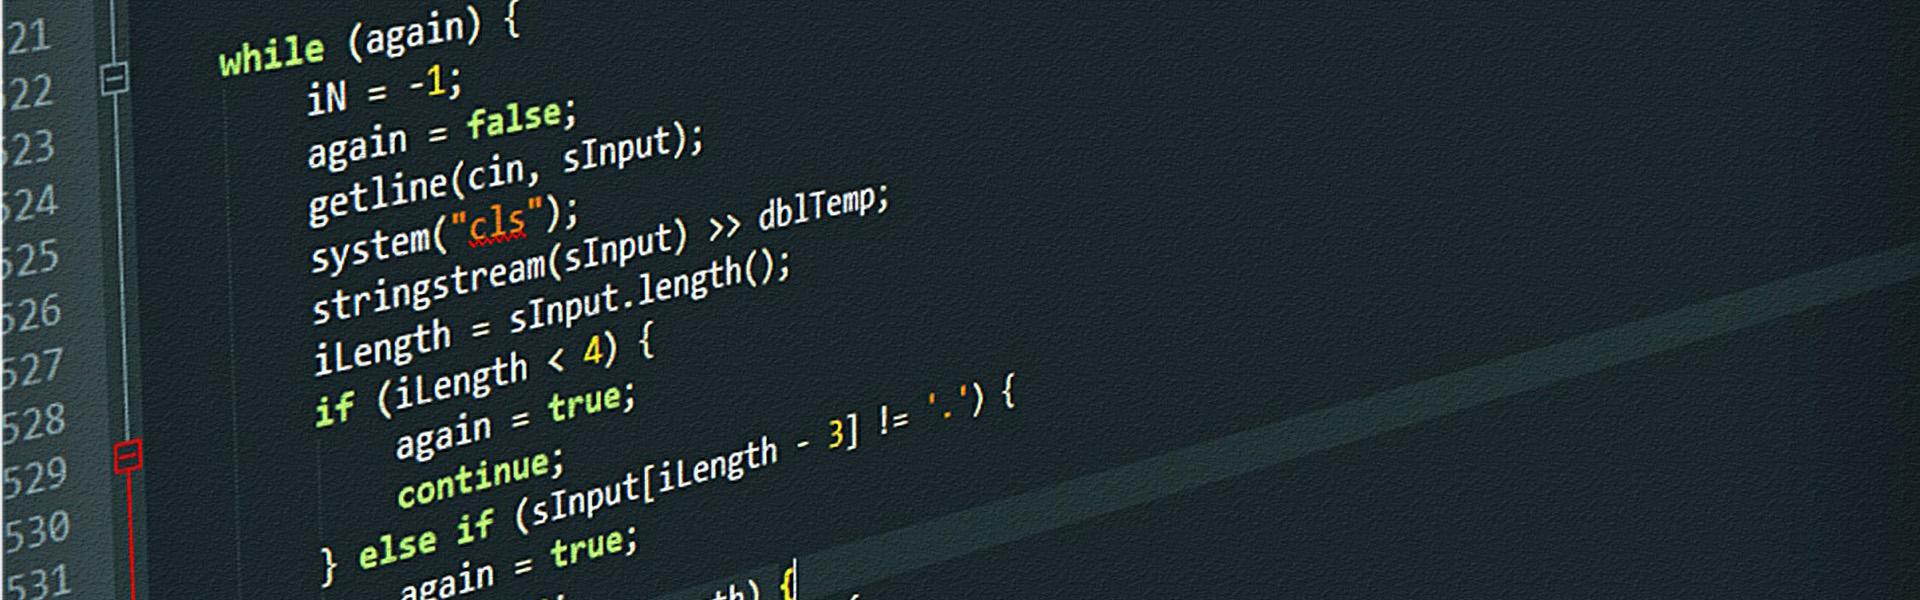 Slider Source Code